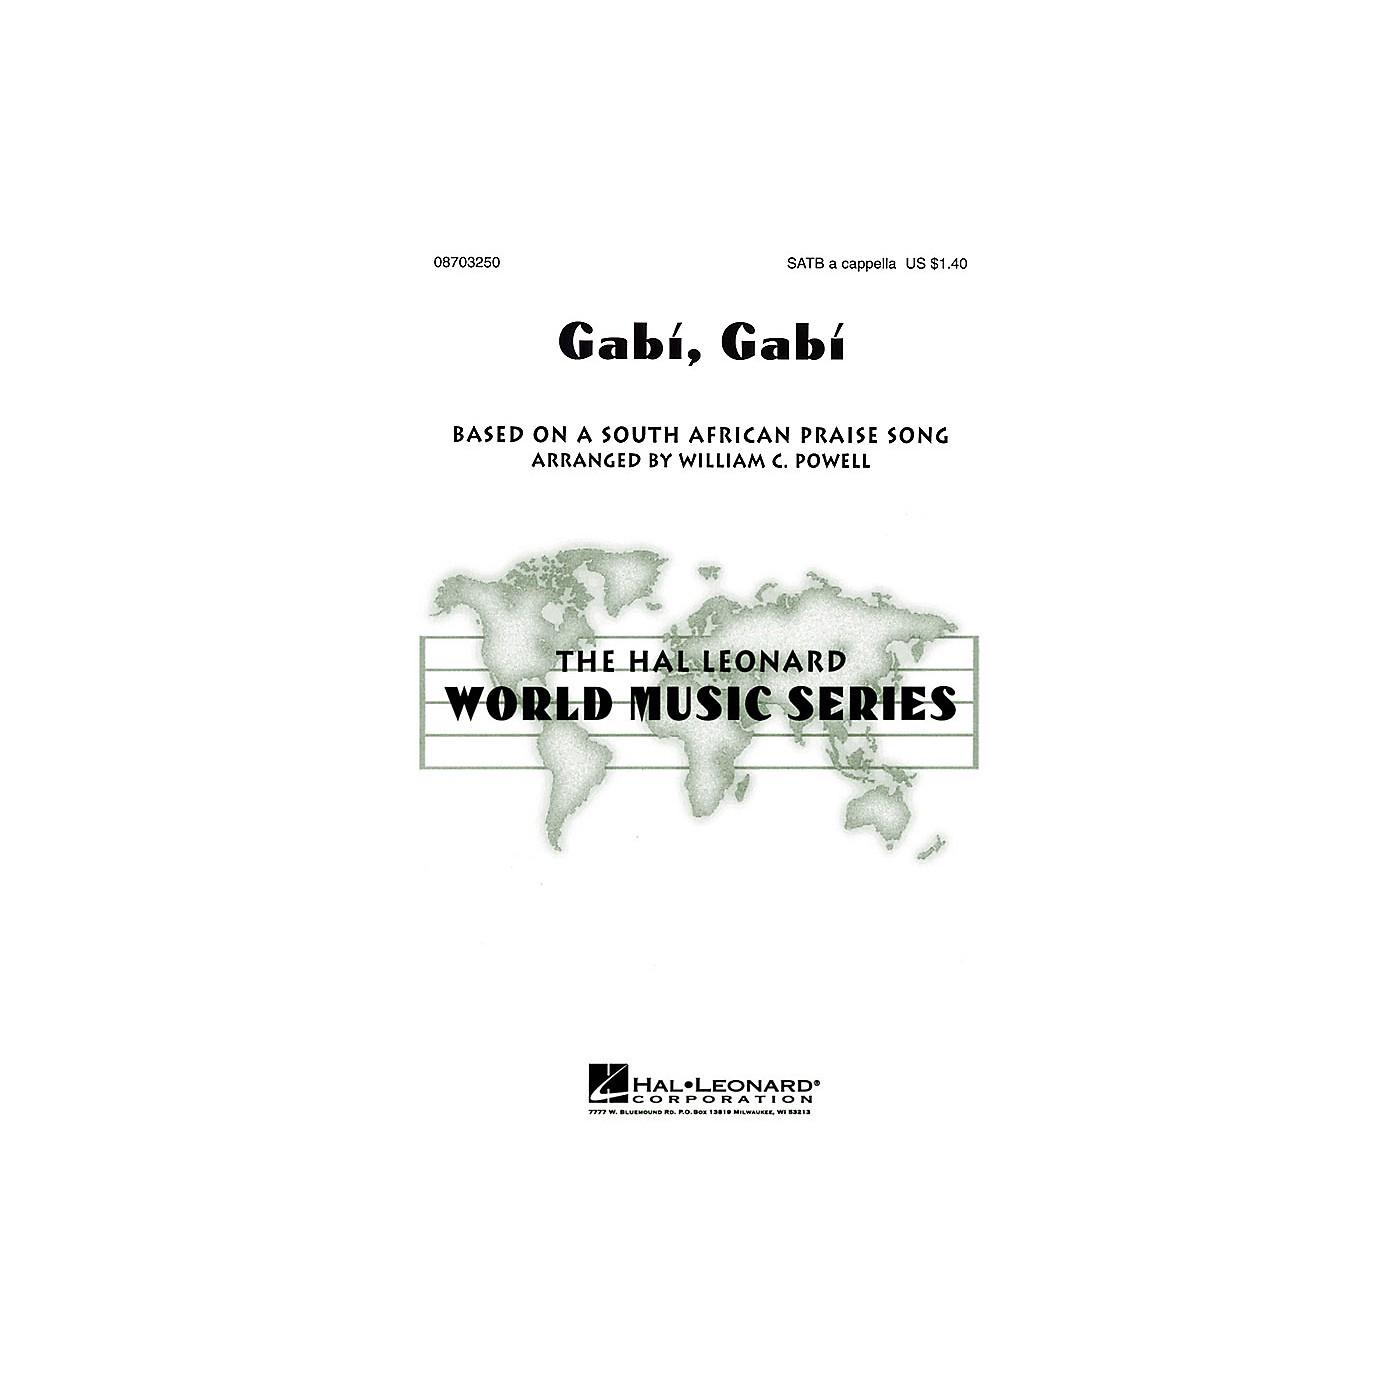 Hal Leonard Gabi, Gabi SATB a cappella arranged by William Powell thumbnail